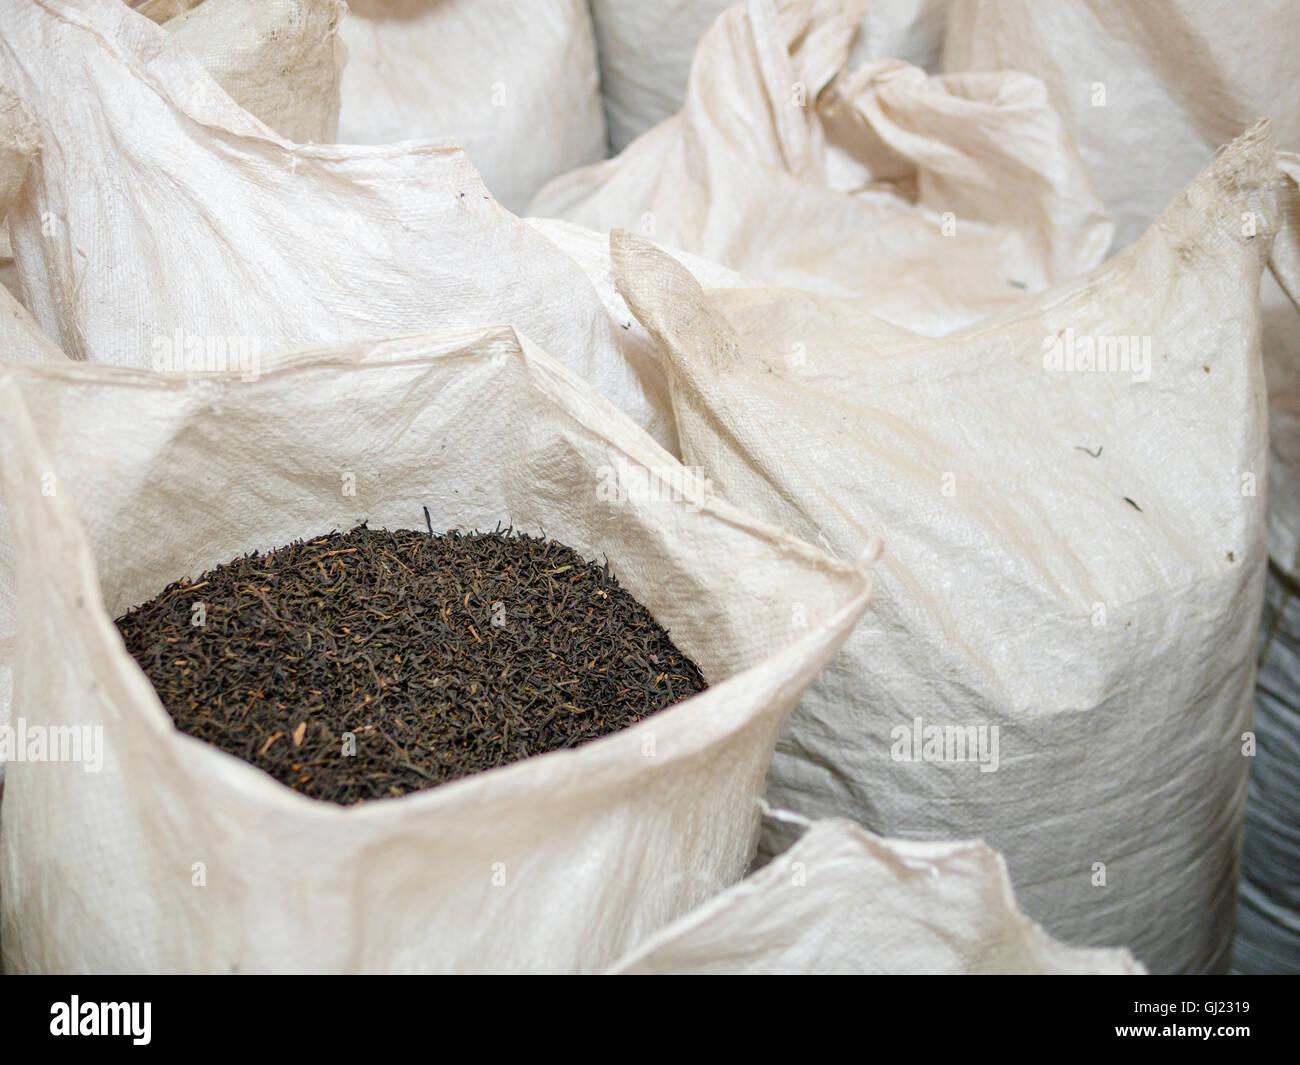 Sacks of Black tea await sorting . Woven plastic  bags of black tea await sorting and packaging at the plantation Stock Photo